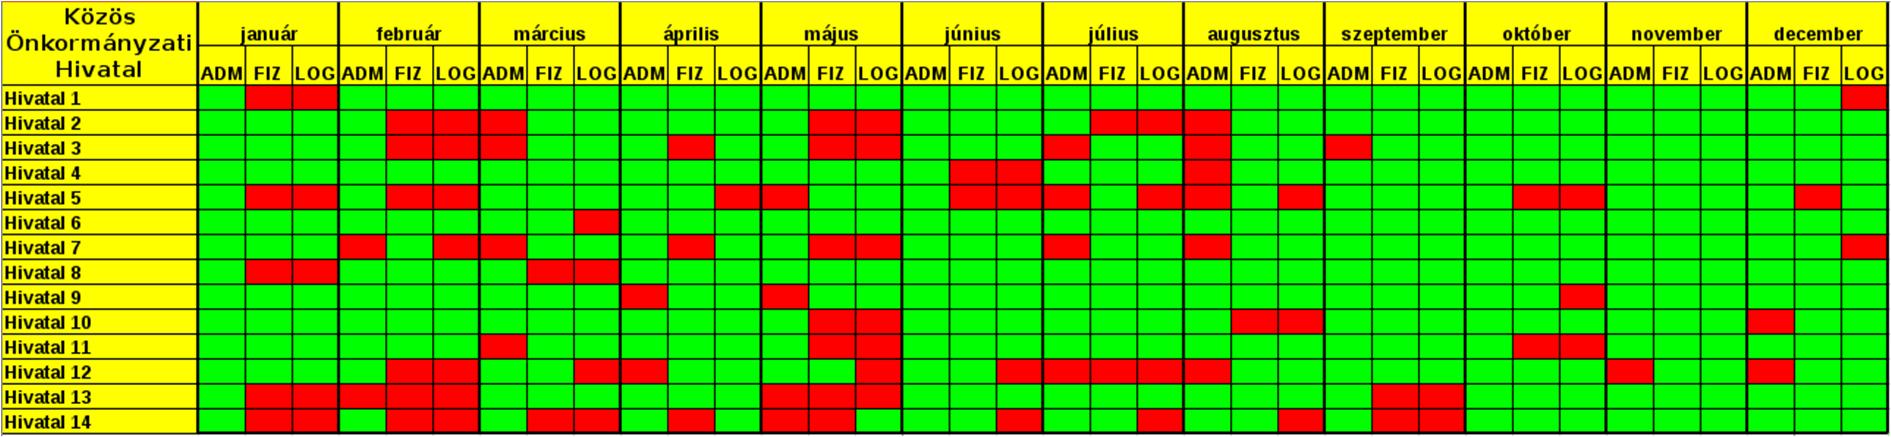 magas vérnyomás ICB kód)